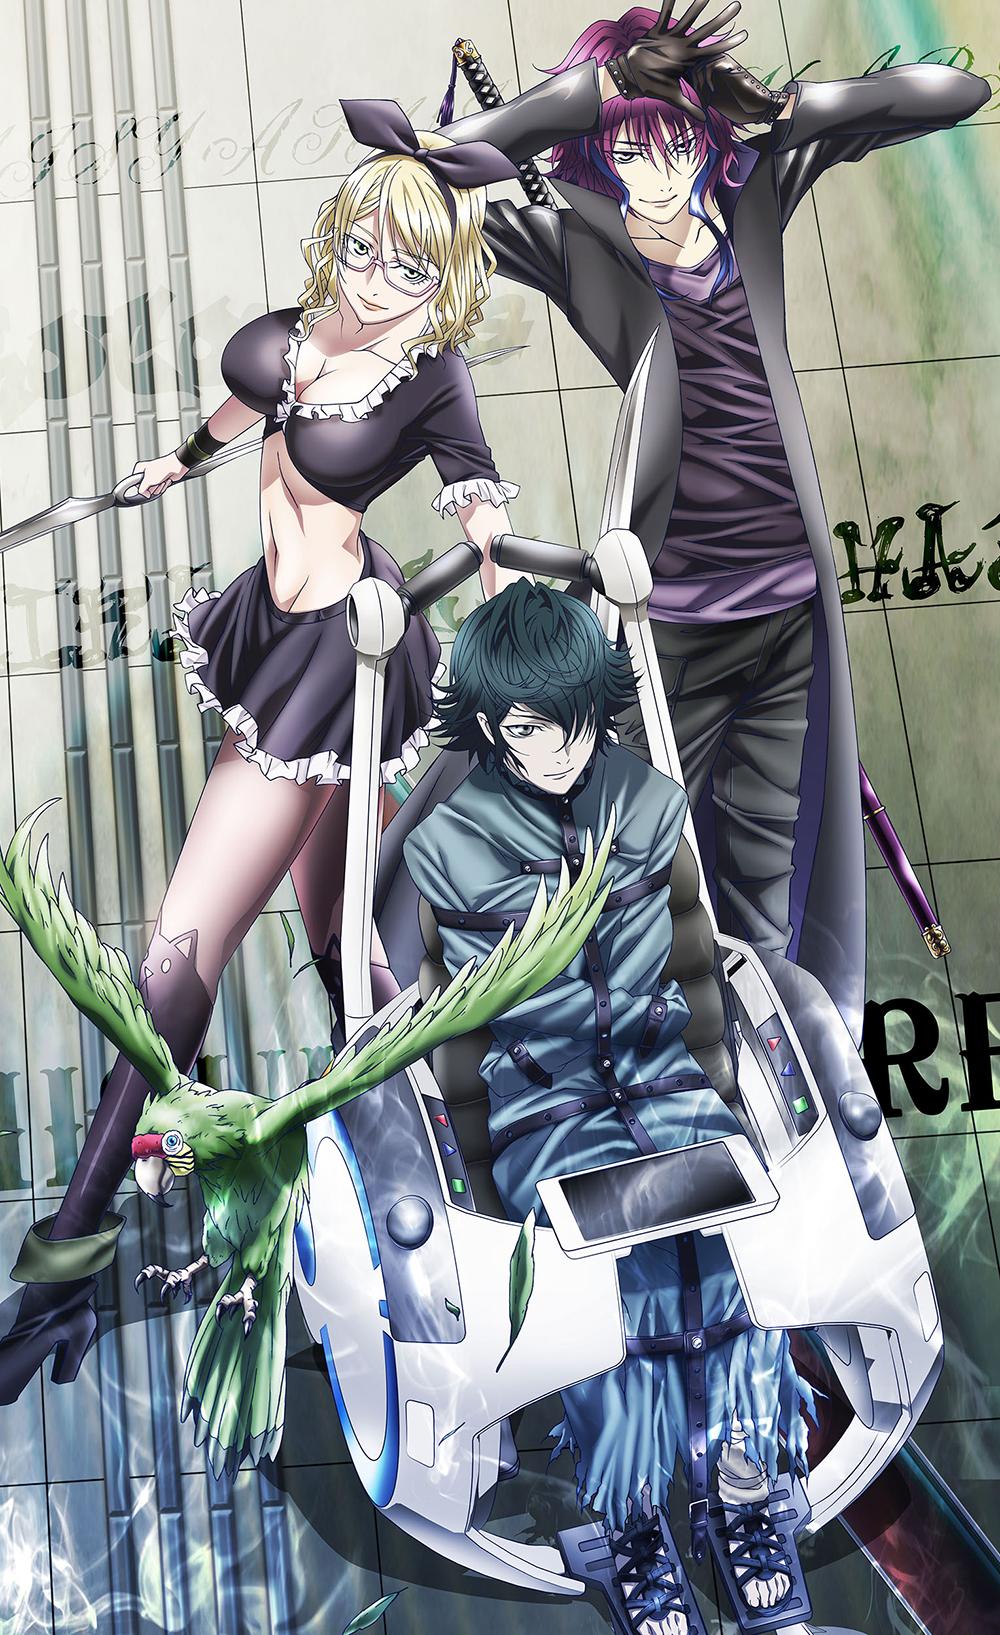 Daisuke namikawa sebagai yashiro isana. K: Return of Kings Visuals & Additional Cast Revealed ...